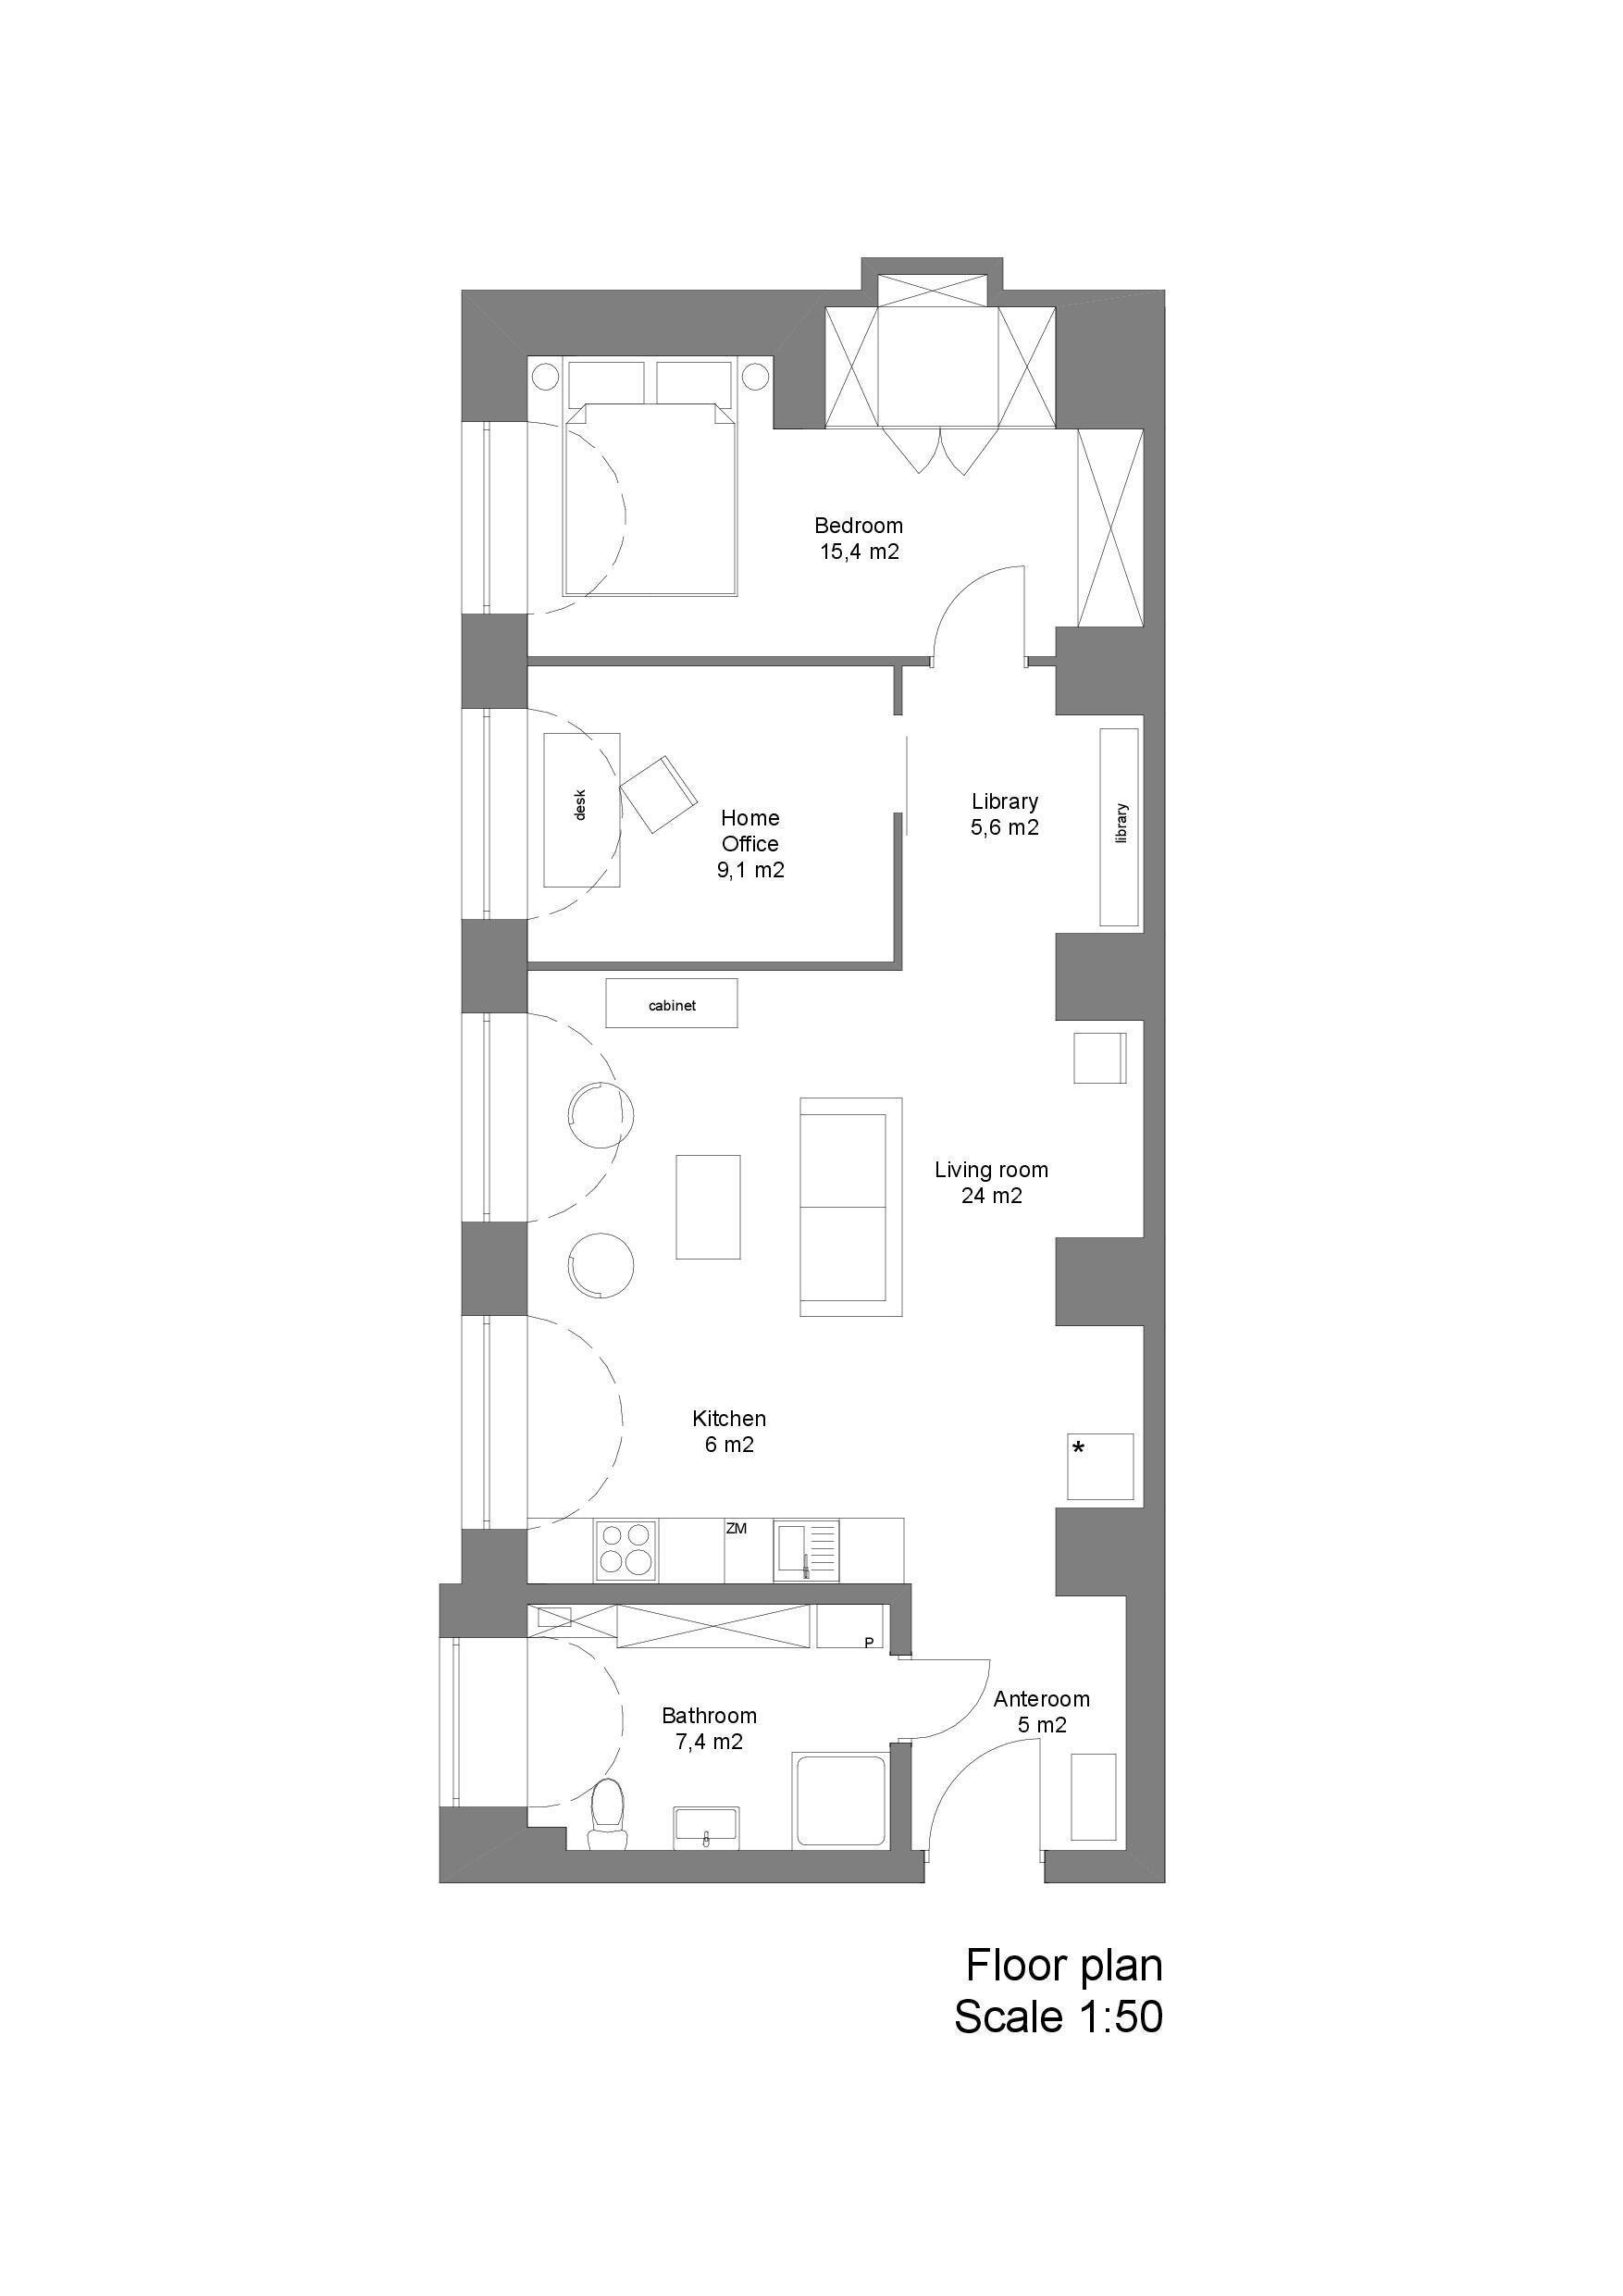 Loft in a Marmalade Factory - Loft Szczecin - Poland - Floor Plan - Humble Homes